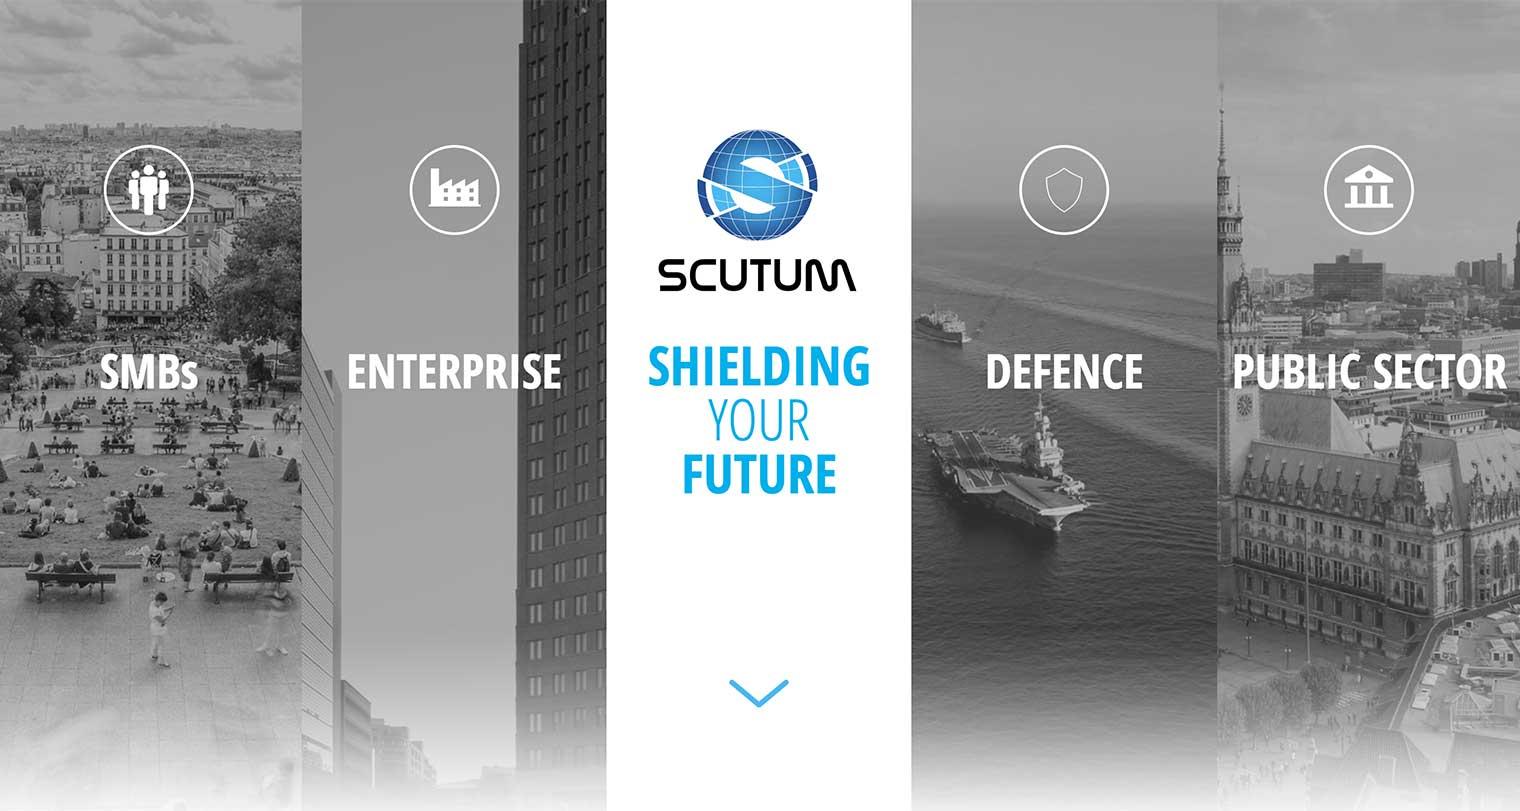 Scutum home page